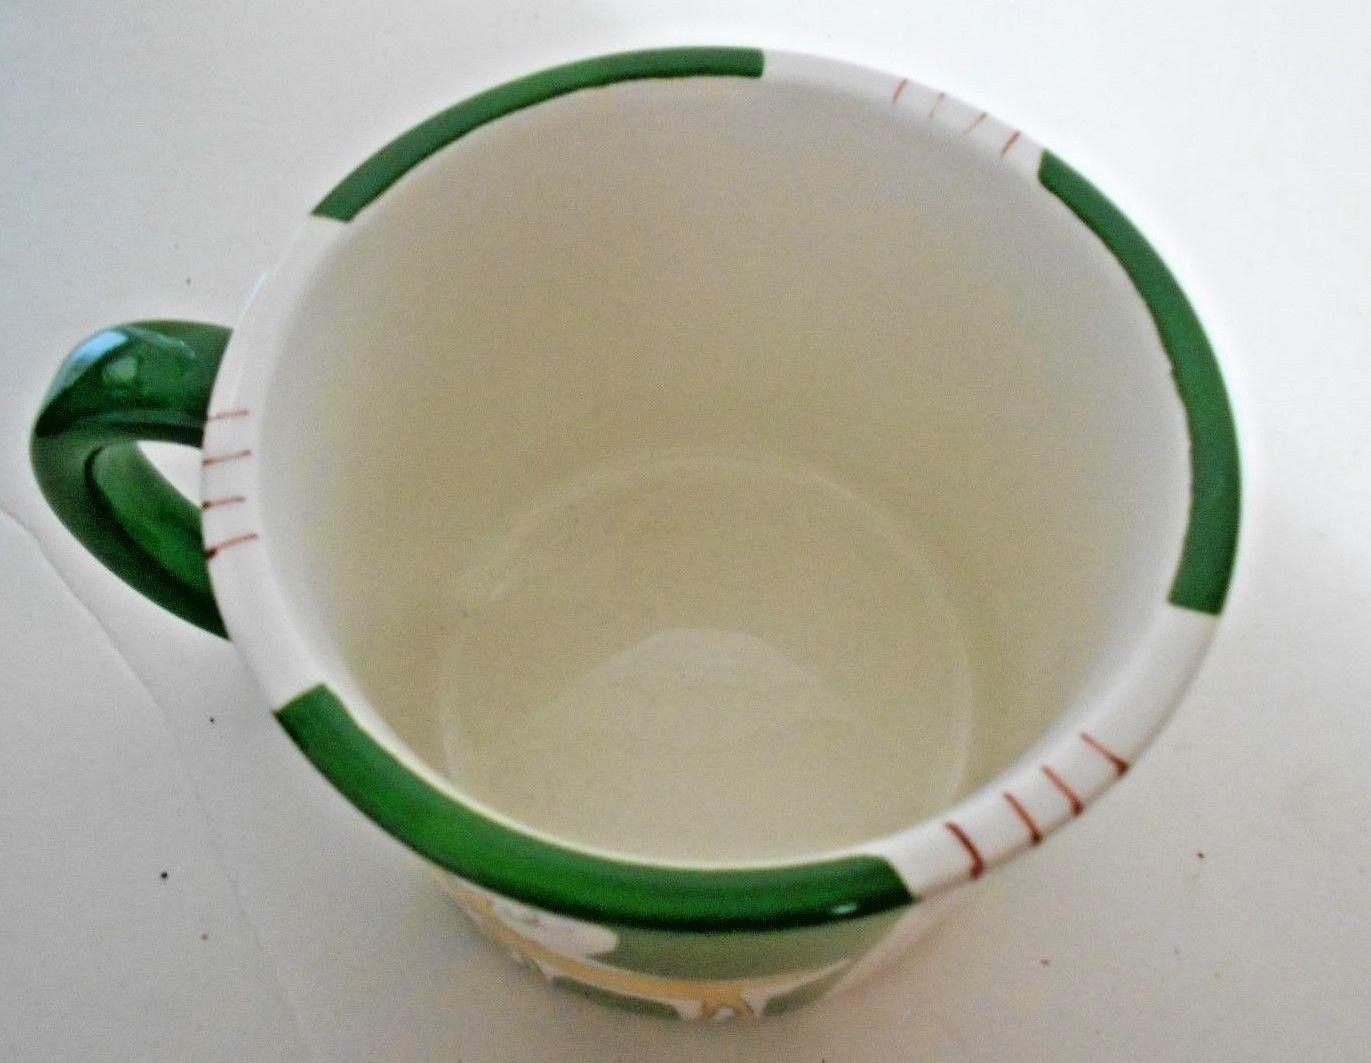 Eddie Bauer Celebrate Reindeer Xmas Holiday Ceramic Mug 16 oz